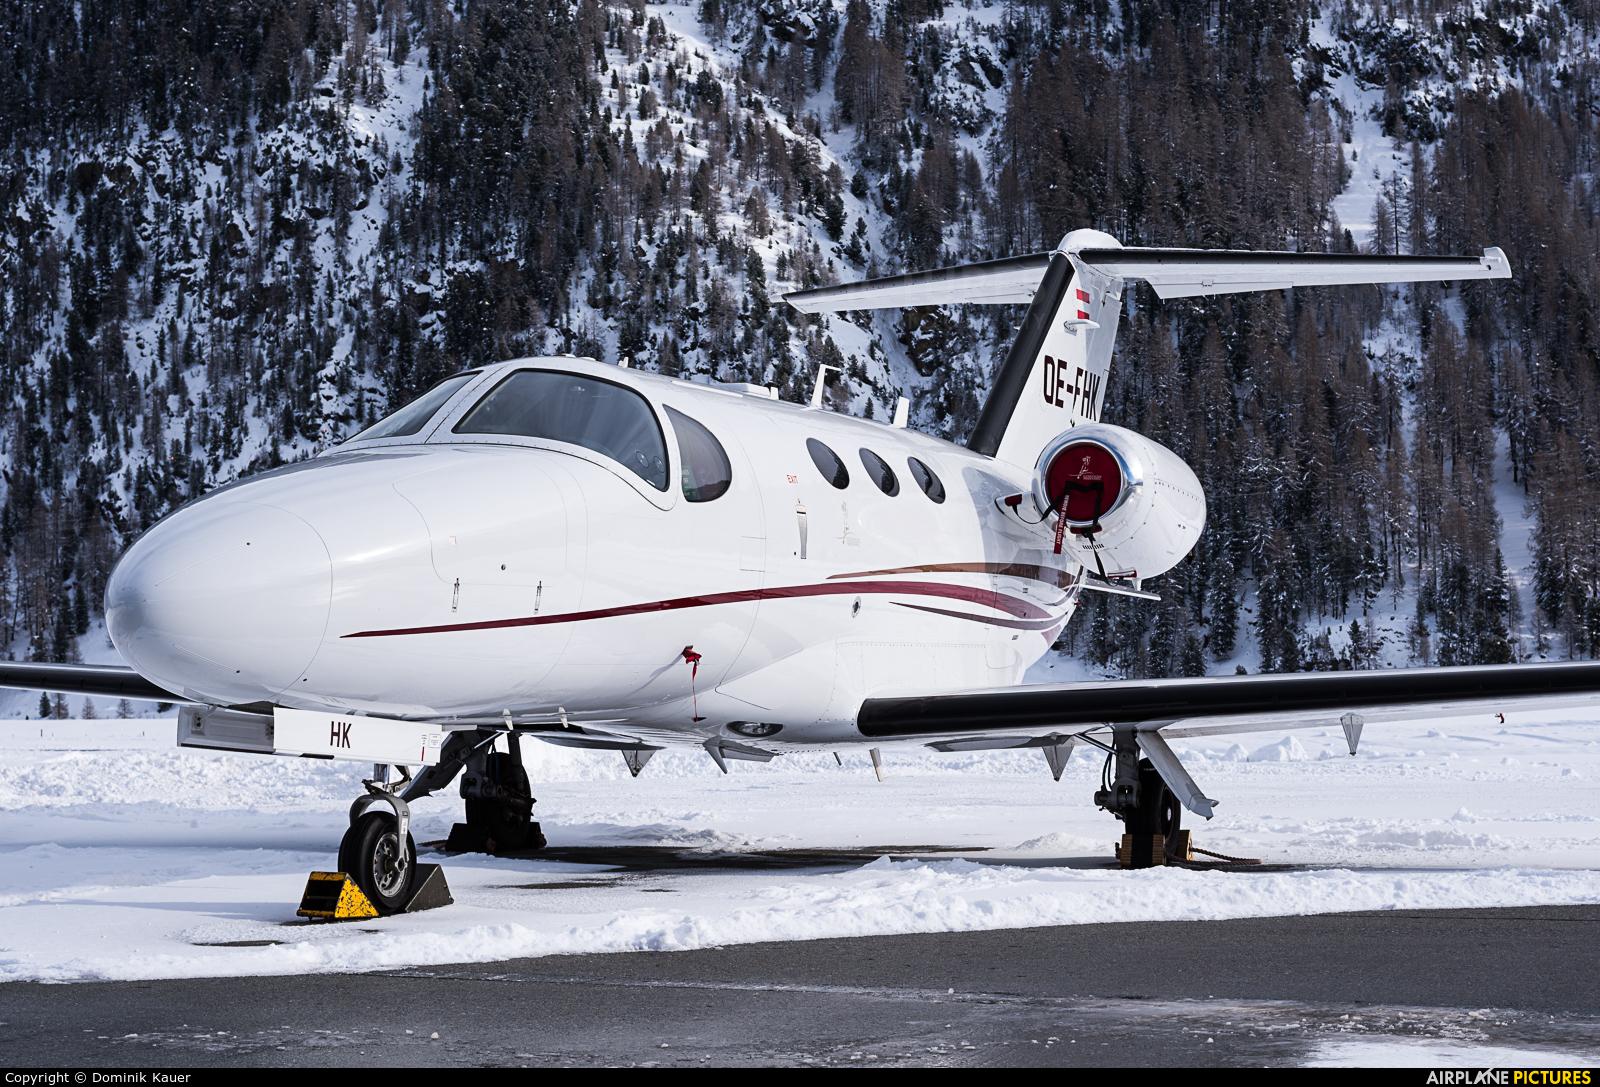 Globe Air OE-FHK aircraft at Samedan - Engadin